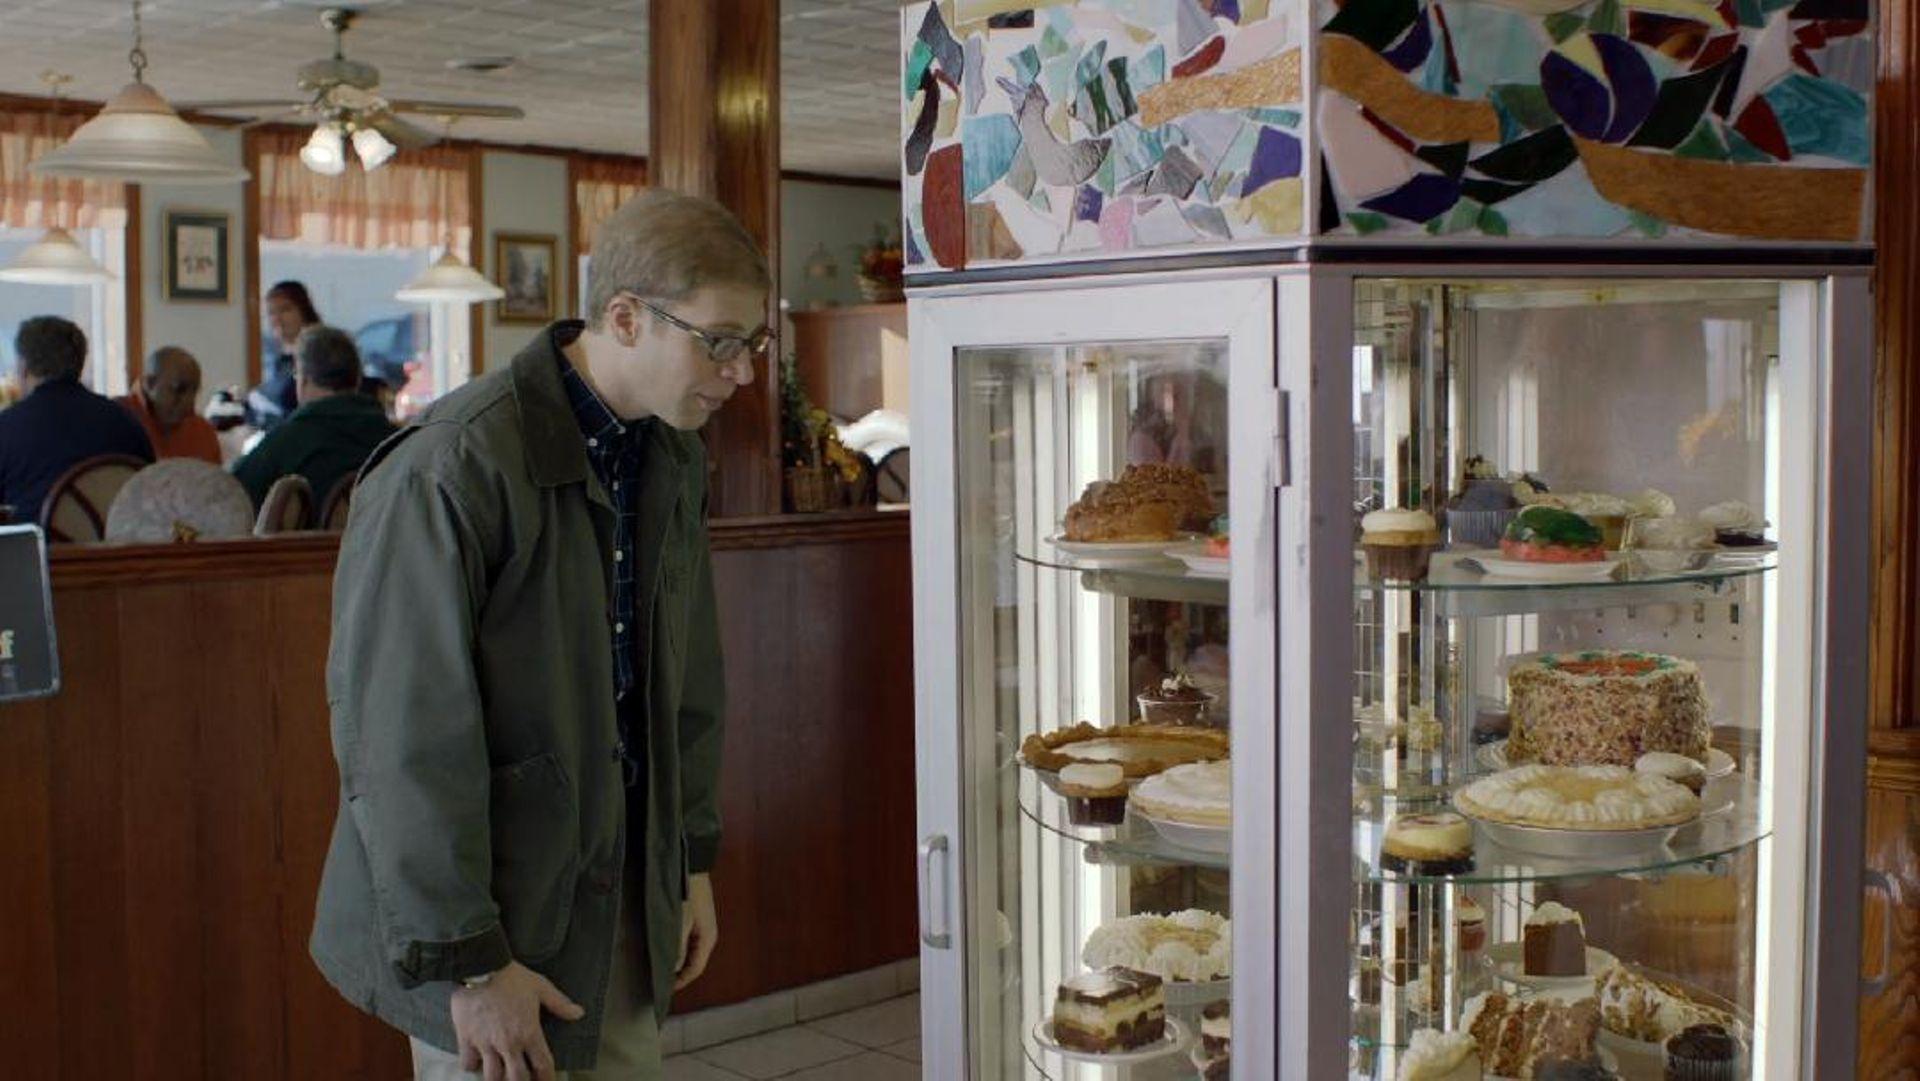 Joe Pera Talks With You - Joe Pera Talks With You Trailer